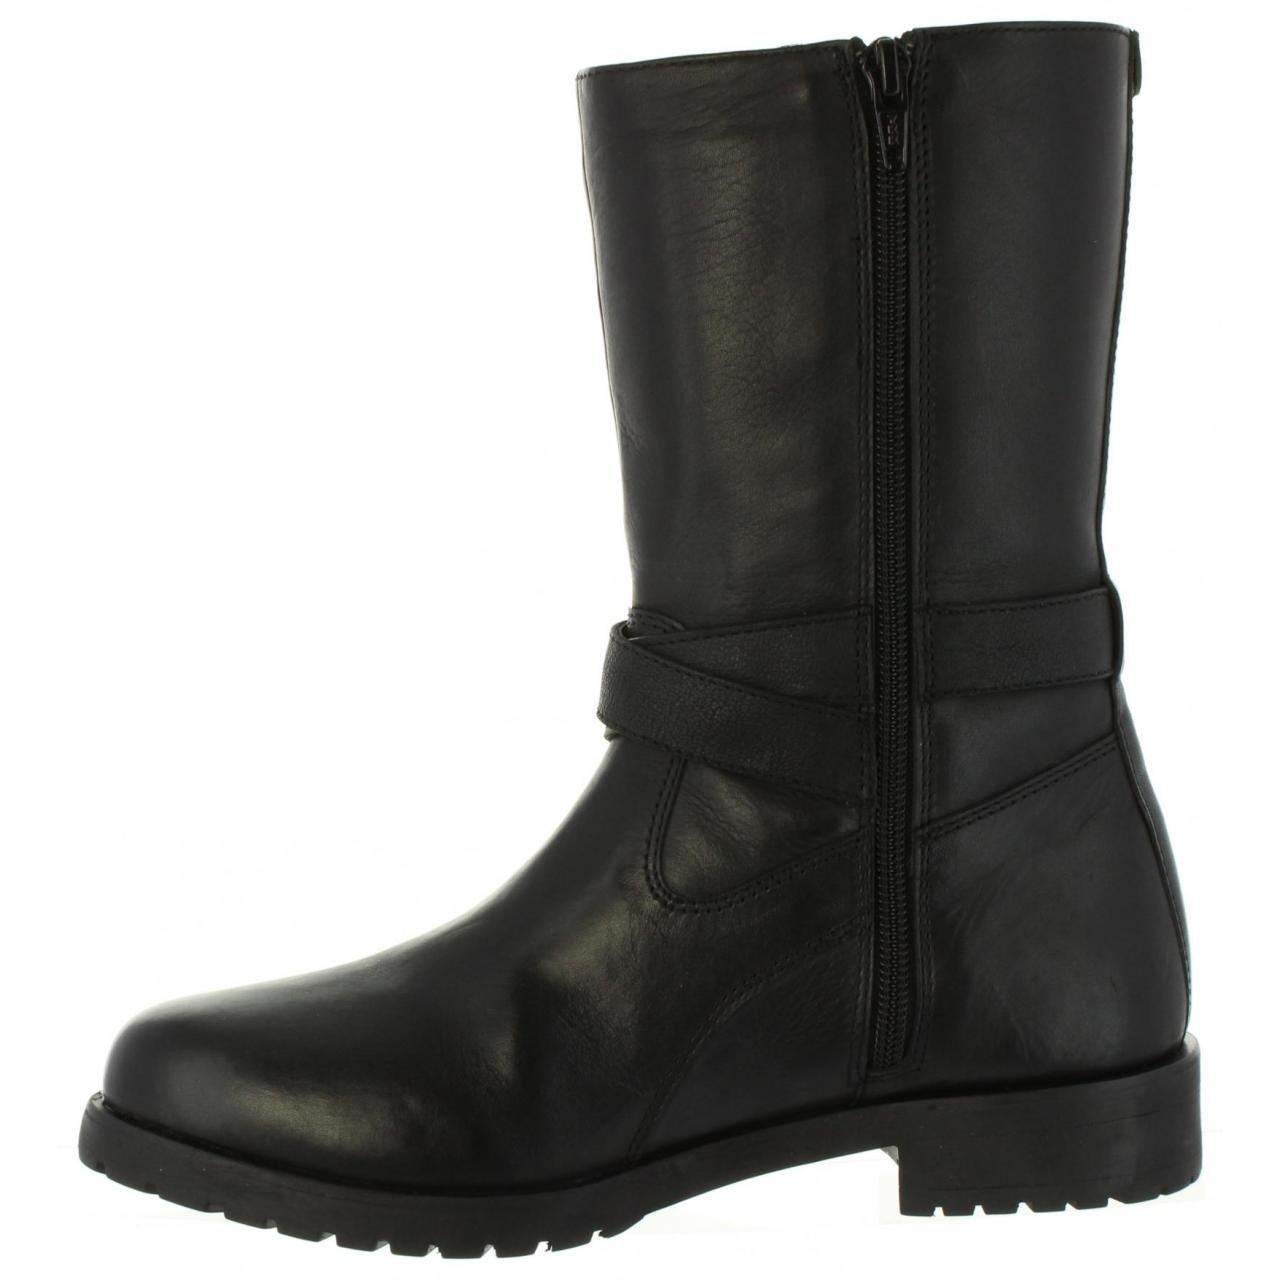 Kickers Women Boots 588820 50 GRACIATO 8 Noir Size 40